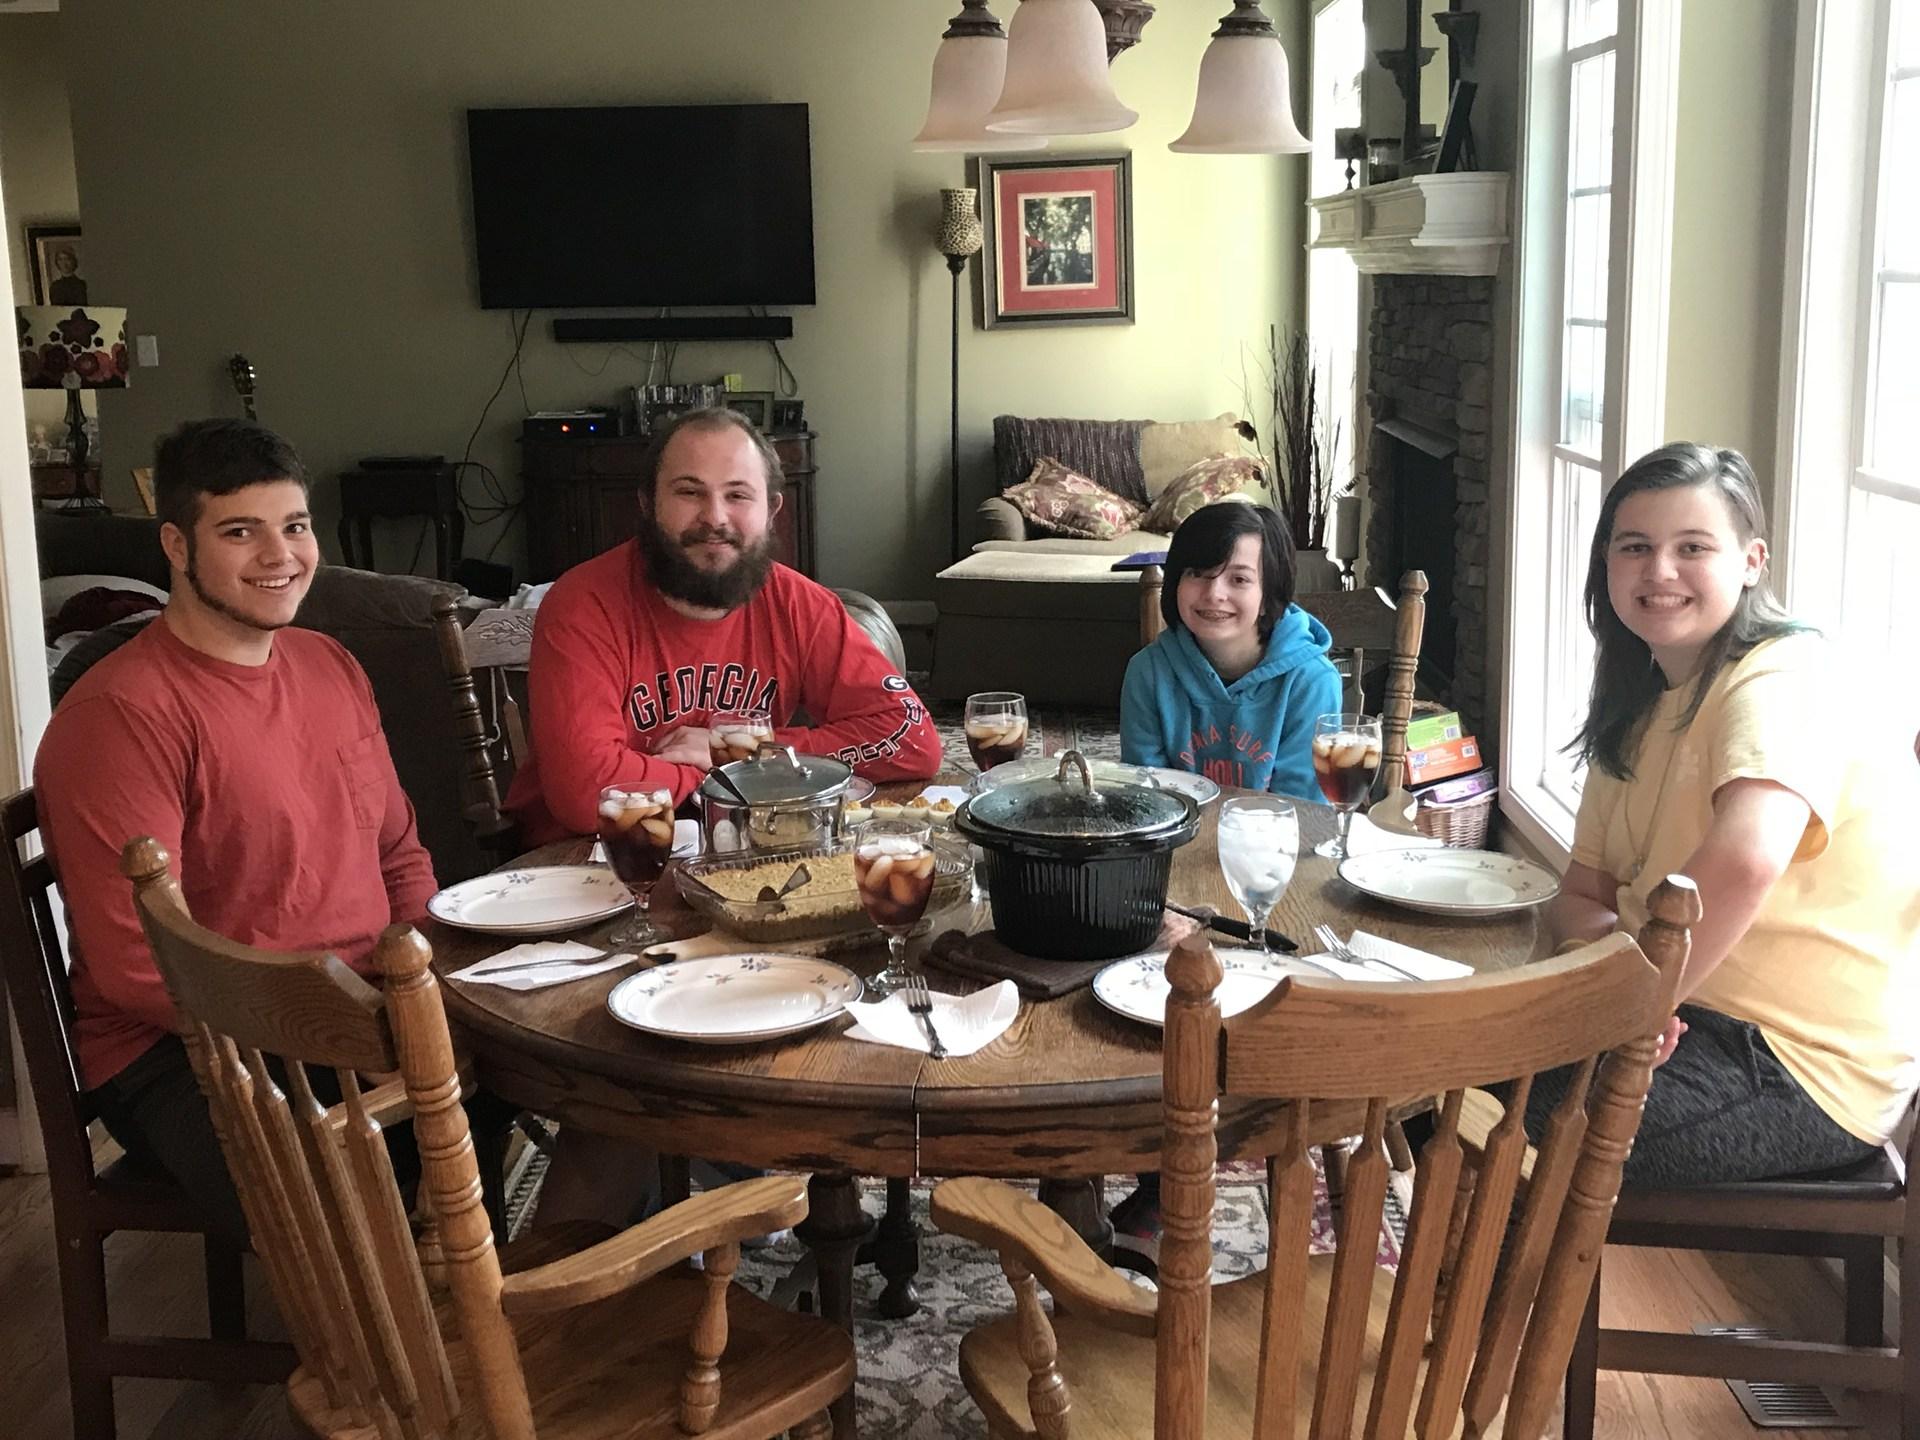 My children at Thanksgiving Dinner 2017